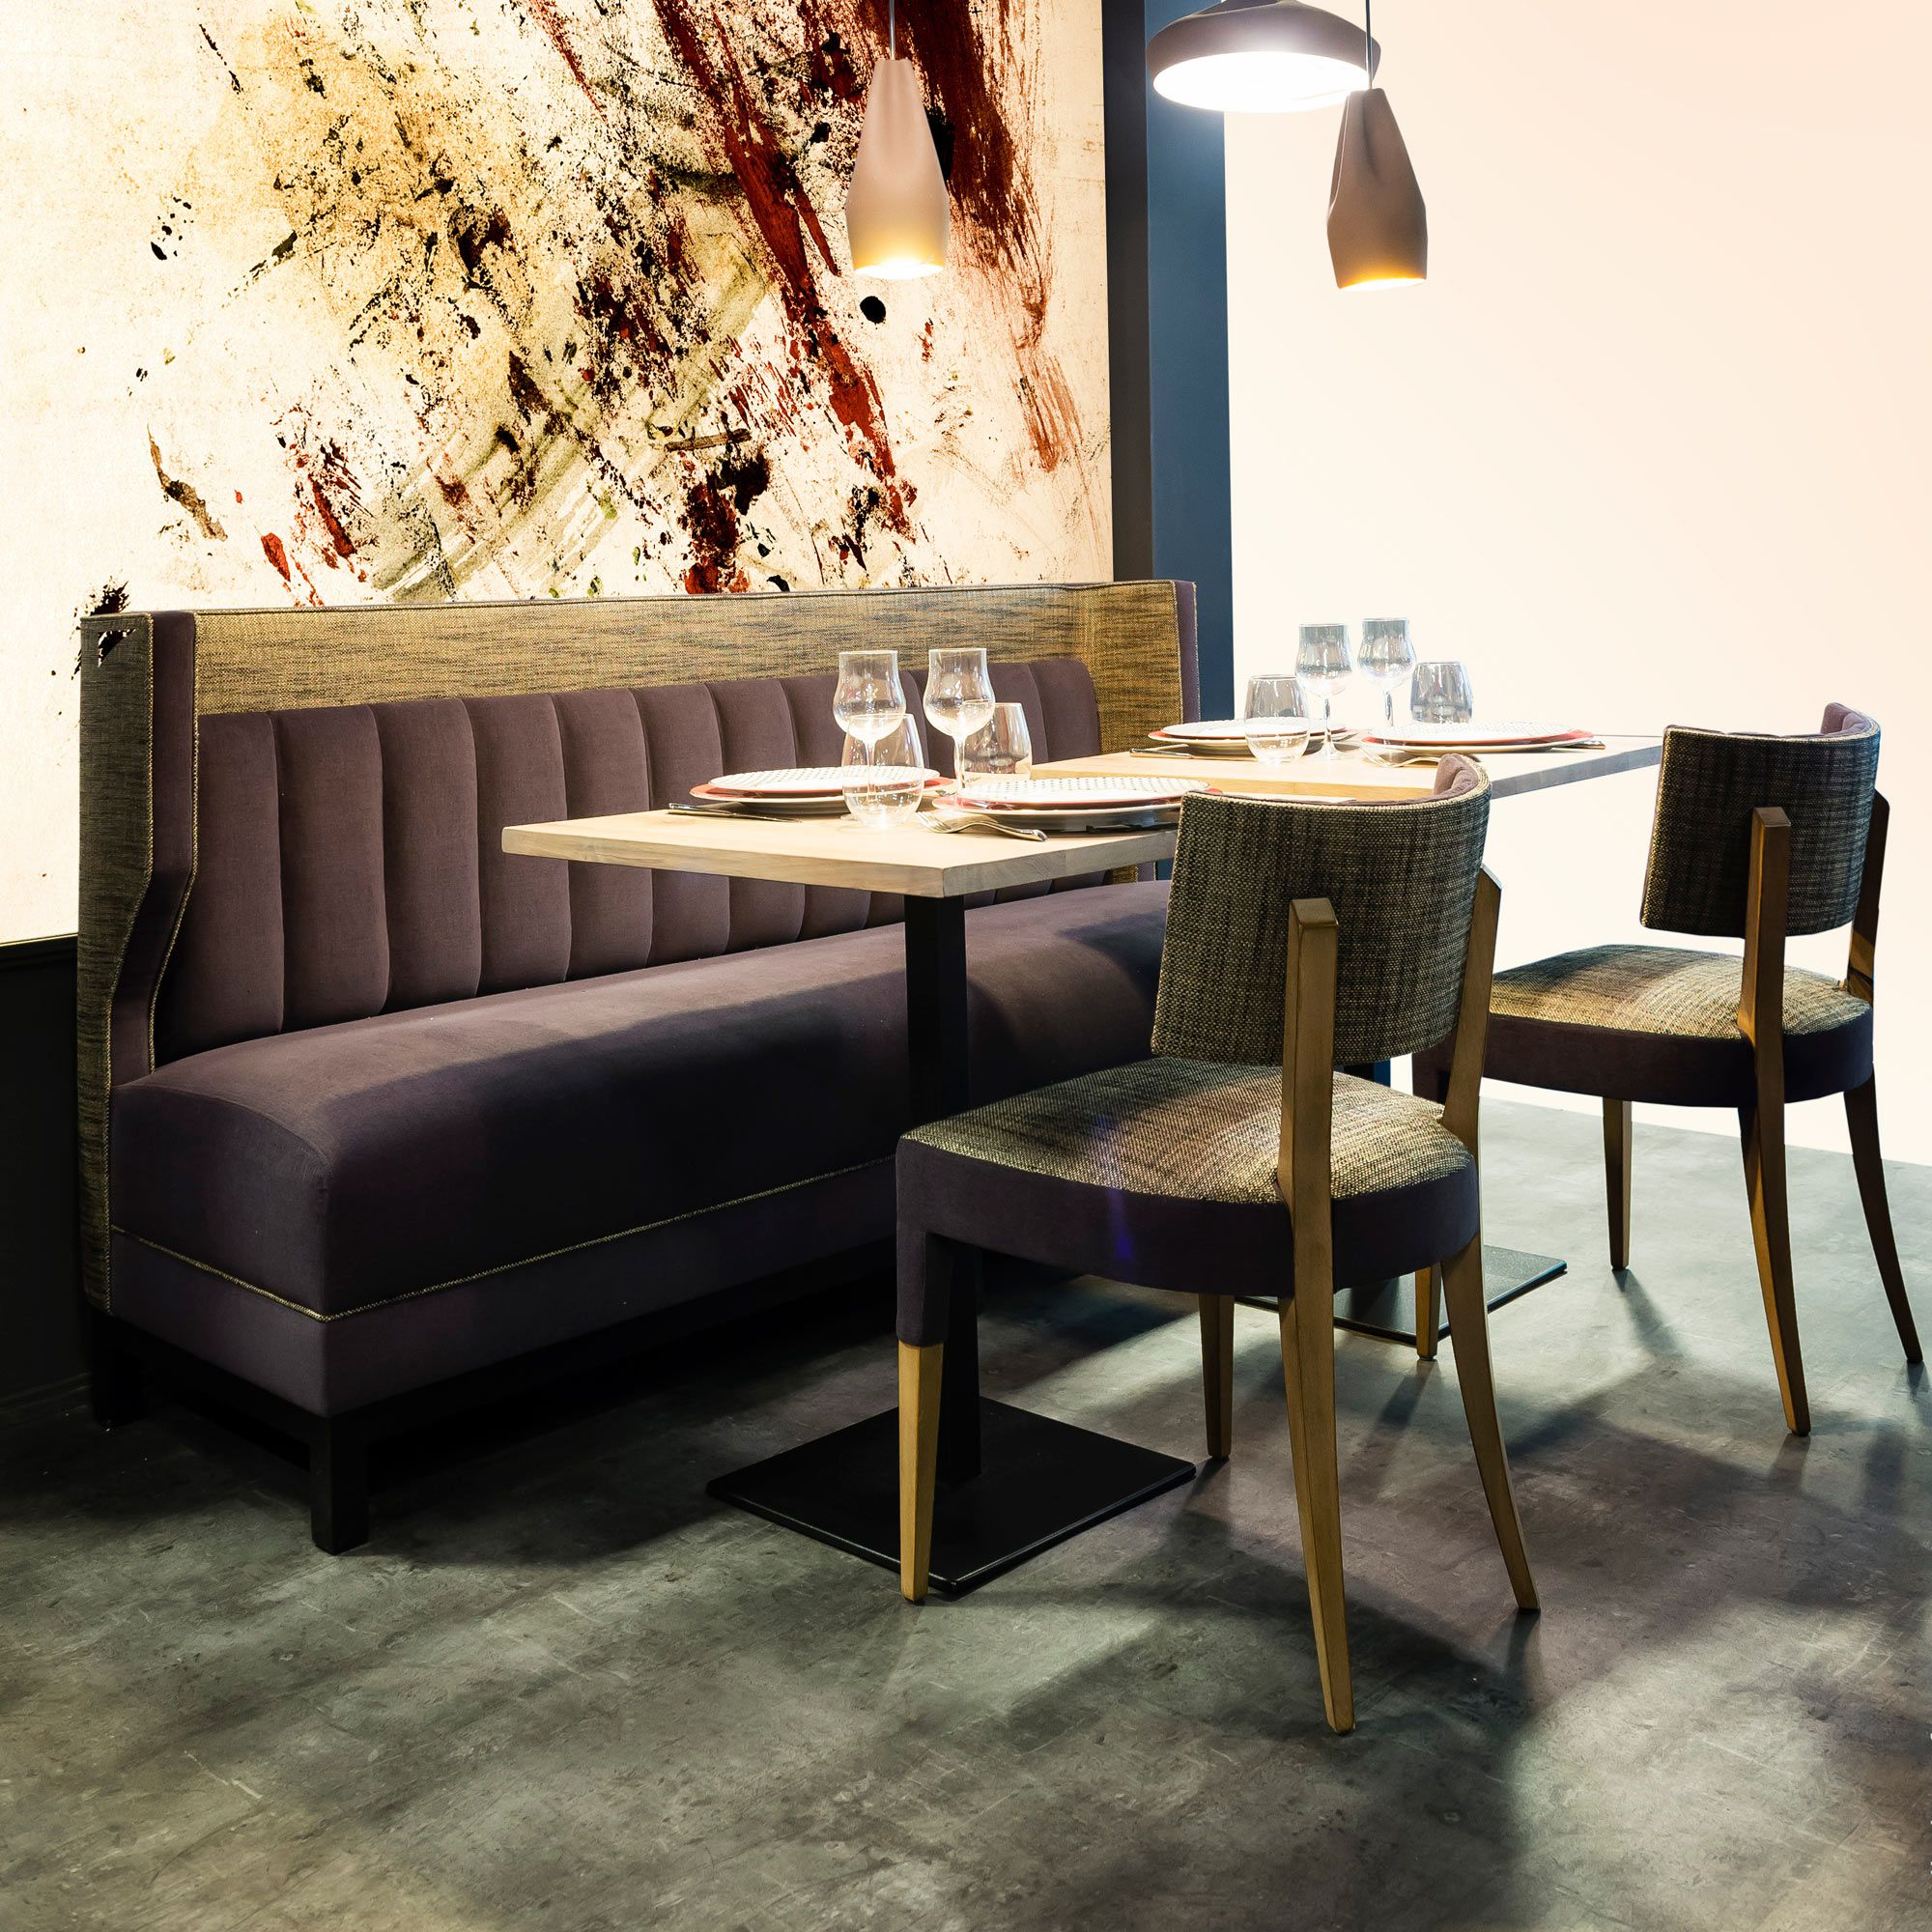 banquette pour restaurant caf largo collinet. Black Bedroom Furniture Sets. Home Design Ideas